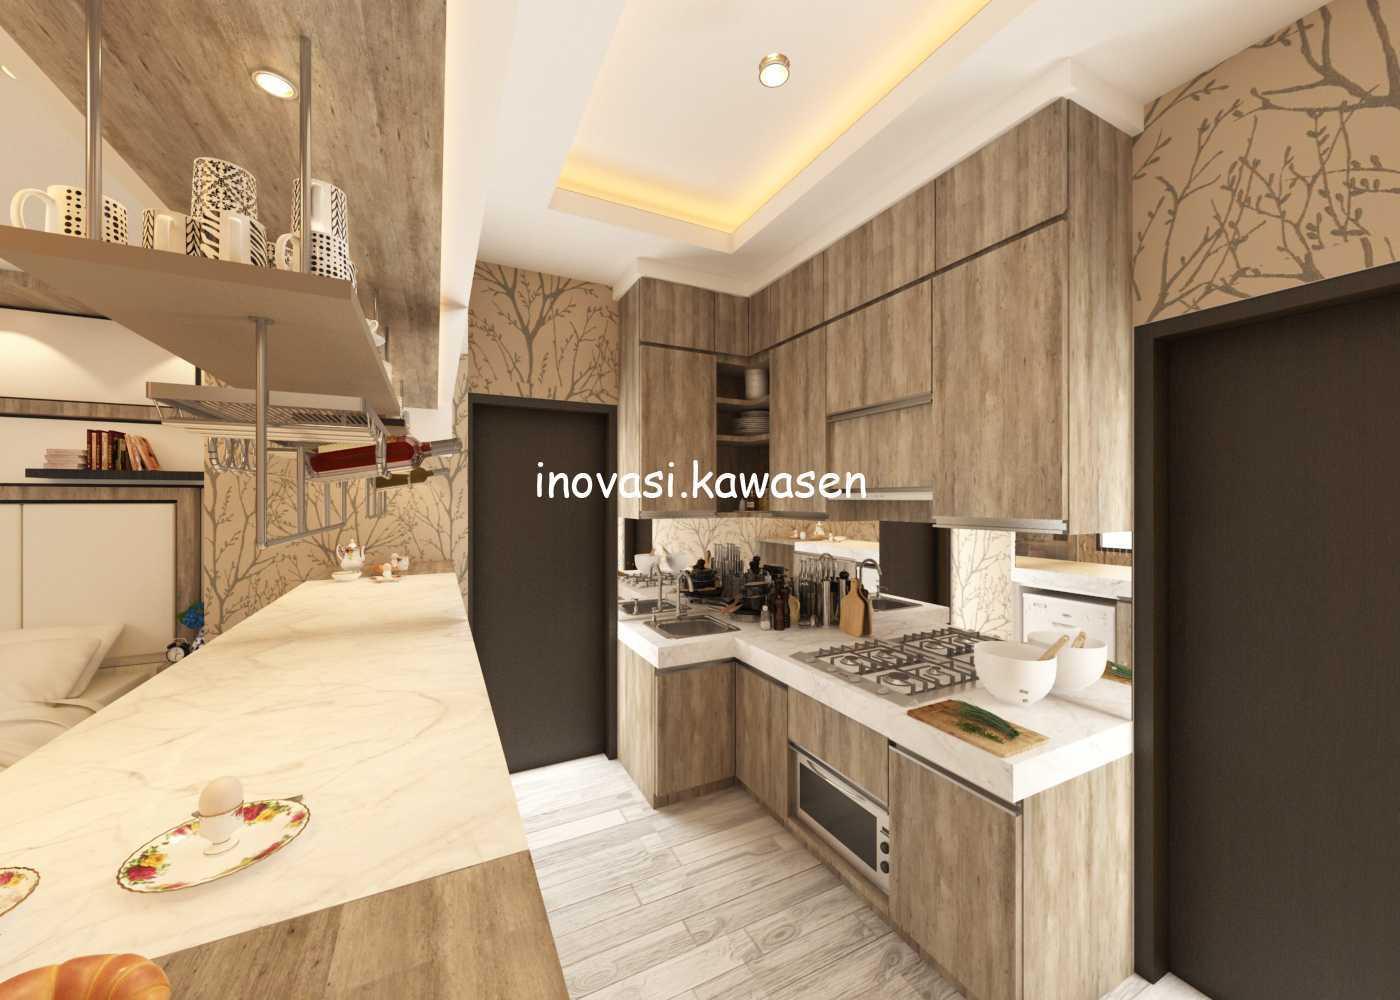 Inovasi Kawasen Interior Apartment Jakarta, Daerah Khusus Ibukota Jakarta, Indonesia Jakarta, Daerah Khusus Ibukota Jakarta, Indonesia Inovasi-Kawasen-Interior-Apartment  89757